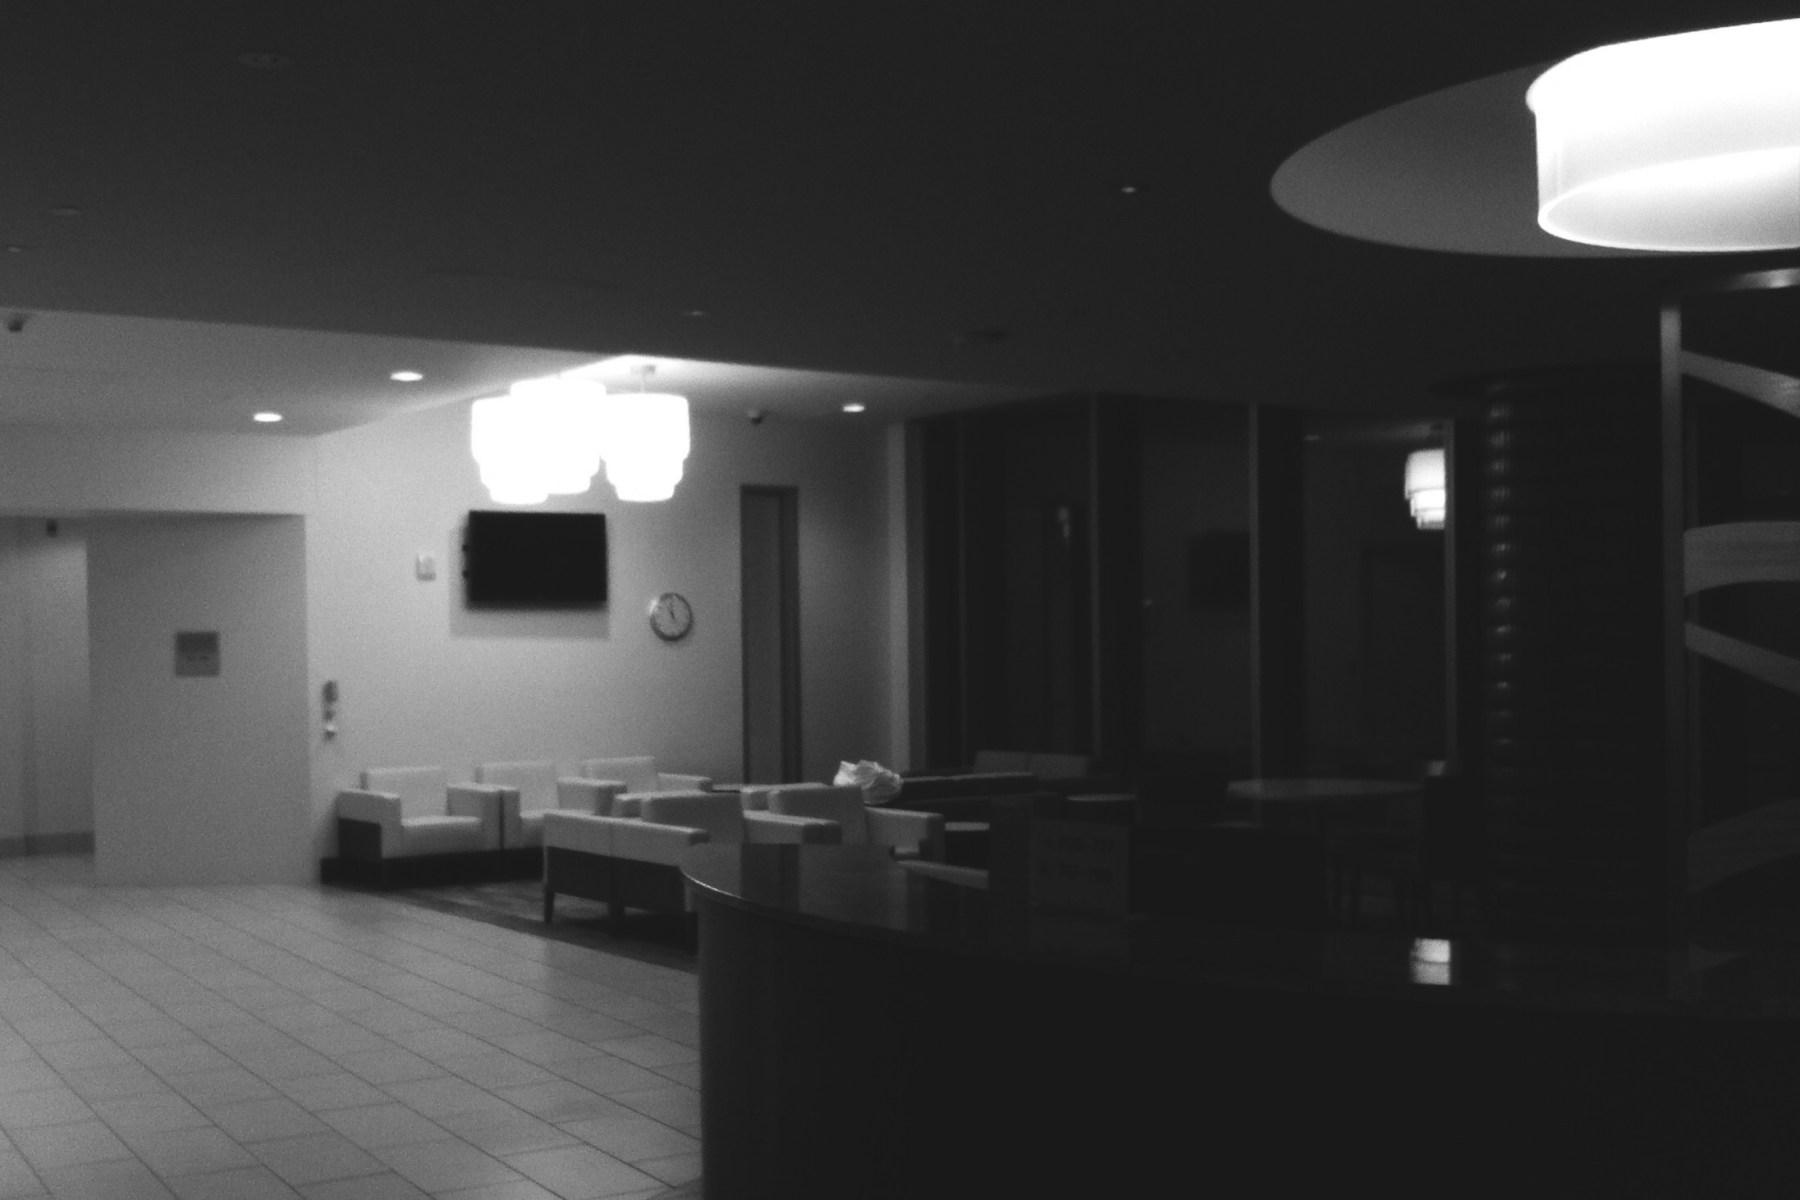 Eerie waiting rooms